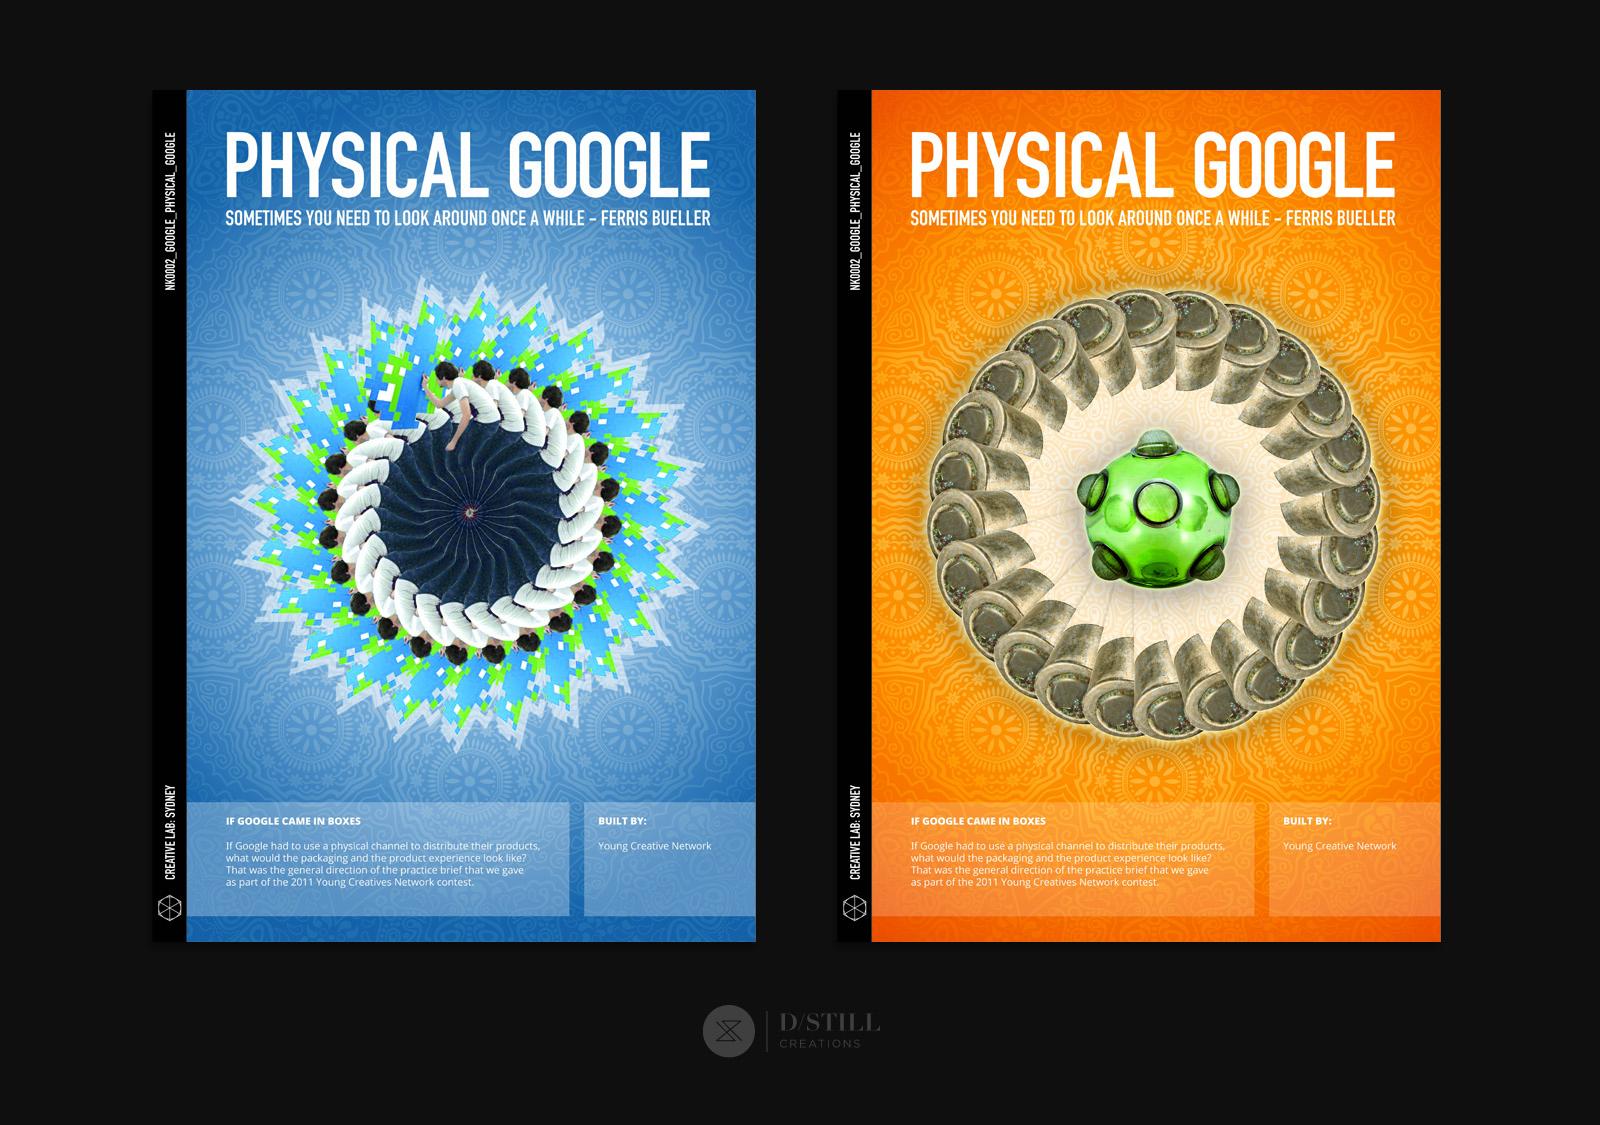 NK0002_Physical_Google_Poster03.jpg